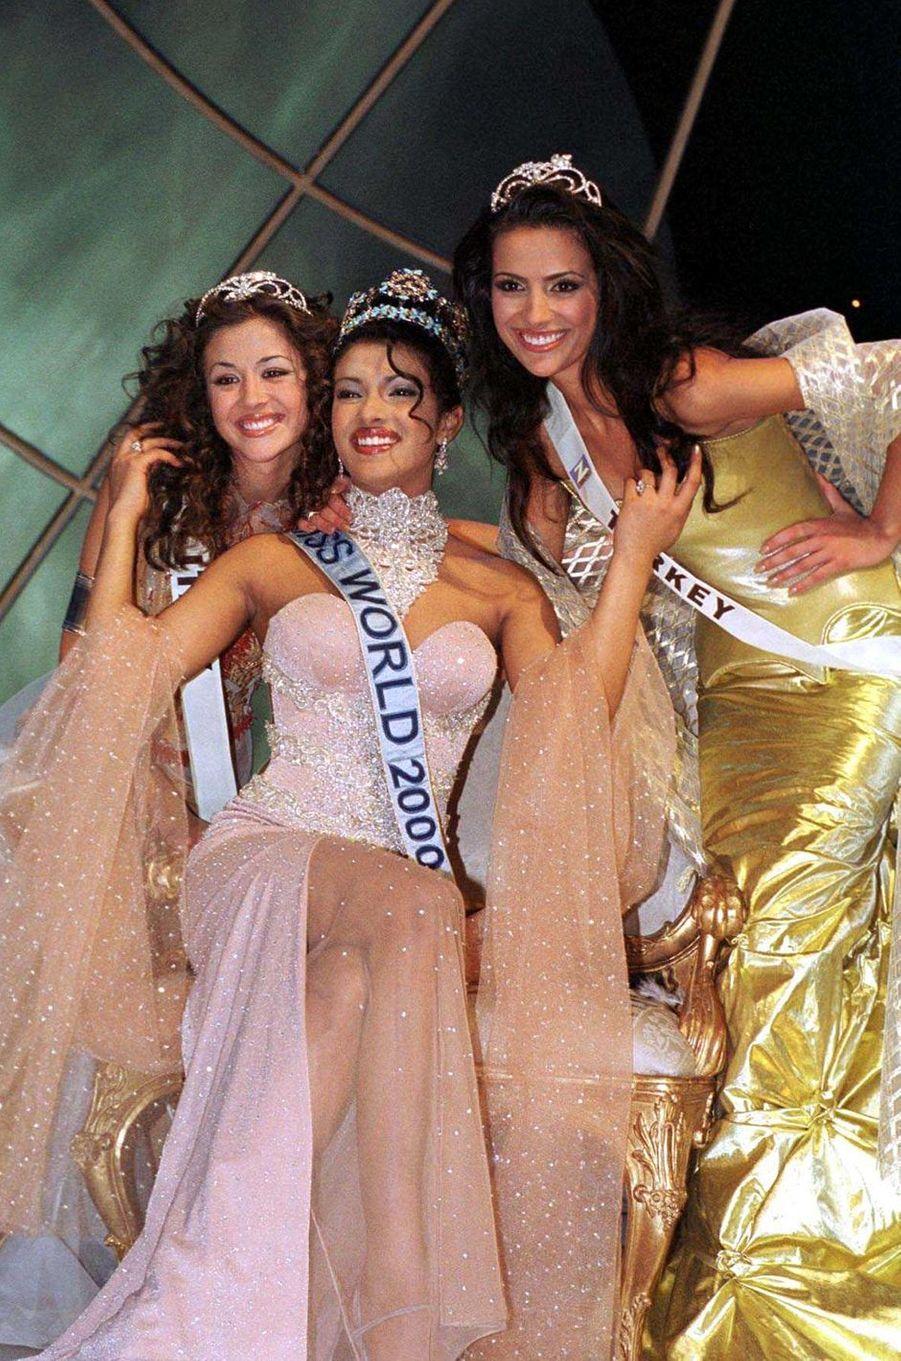 Priyanka Chopra, Miss Monde 2000, entre ses dauphines Miss Italie Giorgia Palmas et Miss TurquieYüksel Ak,le 30 novembre 2000 à Londres